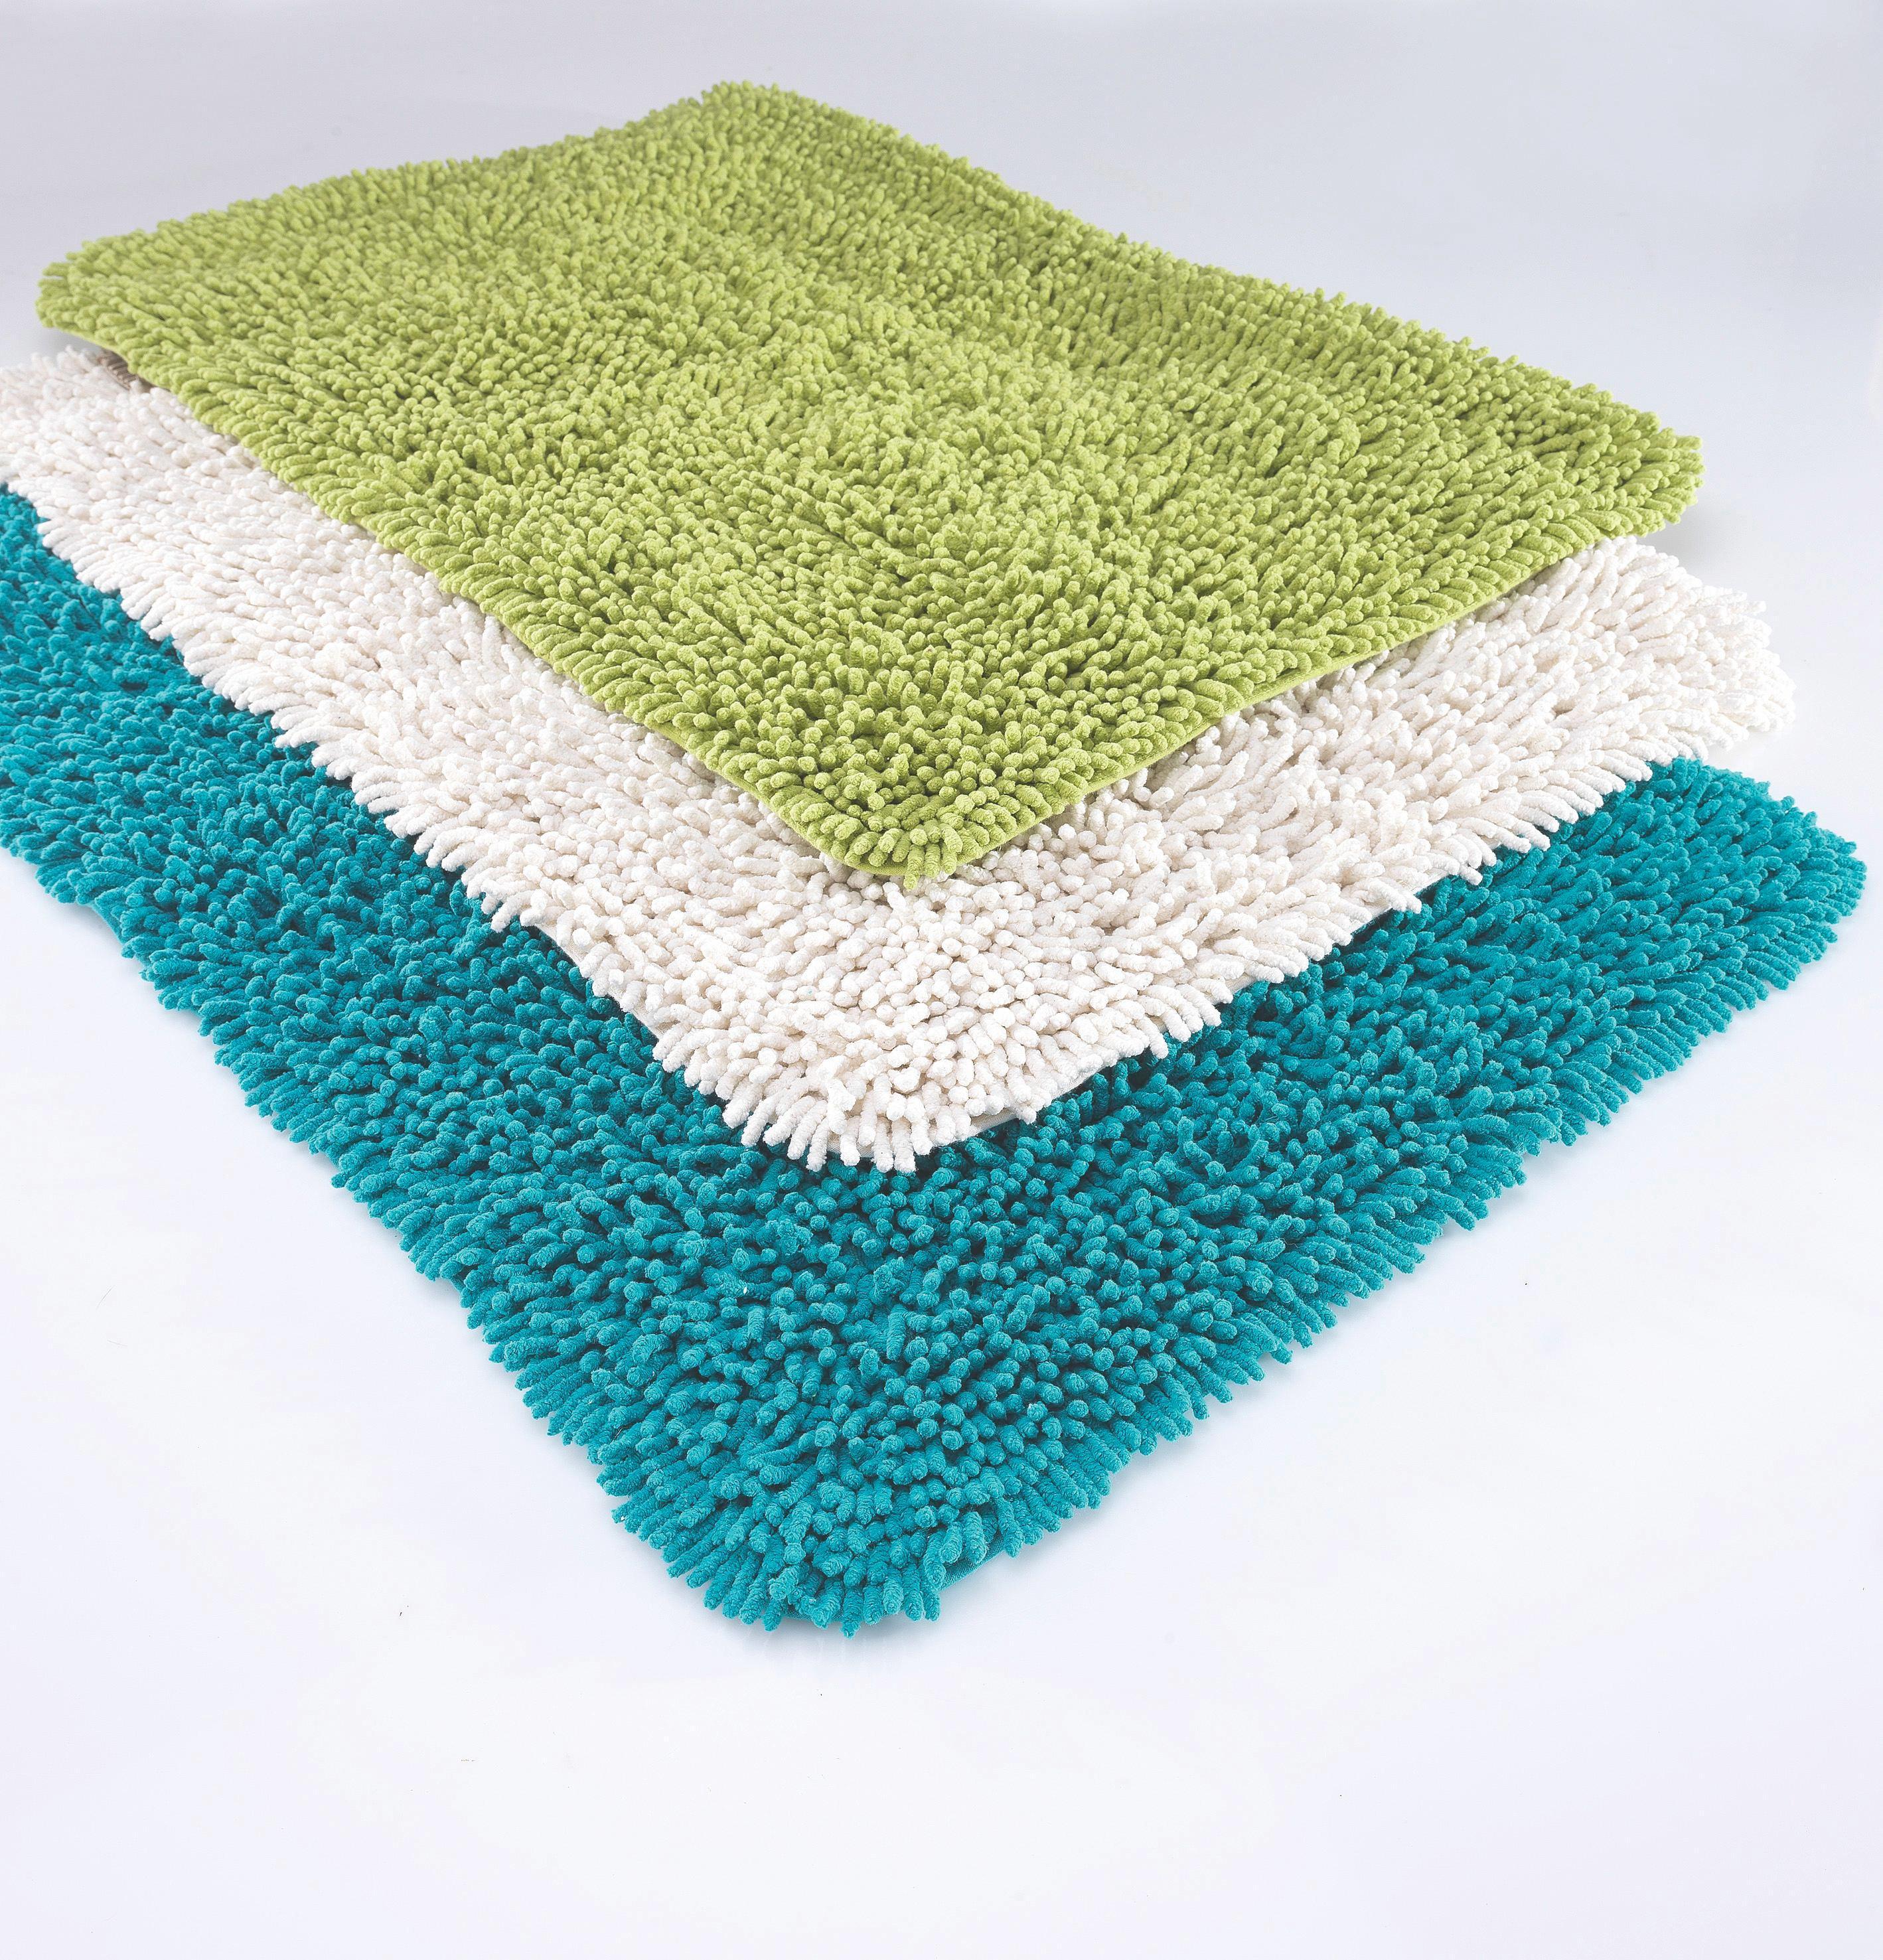 Badteppich Jenny ca. 60x90cm - Grün, Textil (60/90cm) - MÖMAX modern living